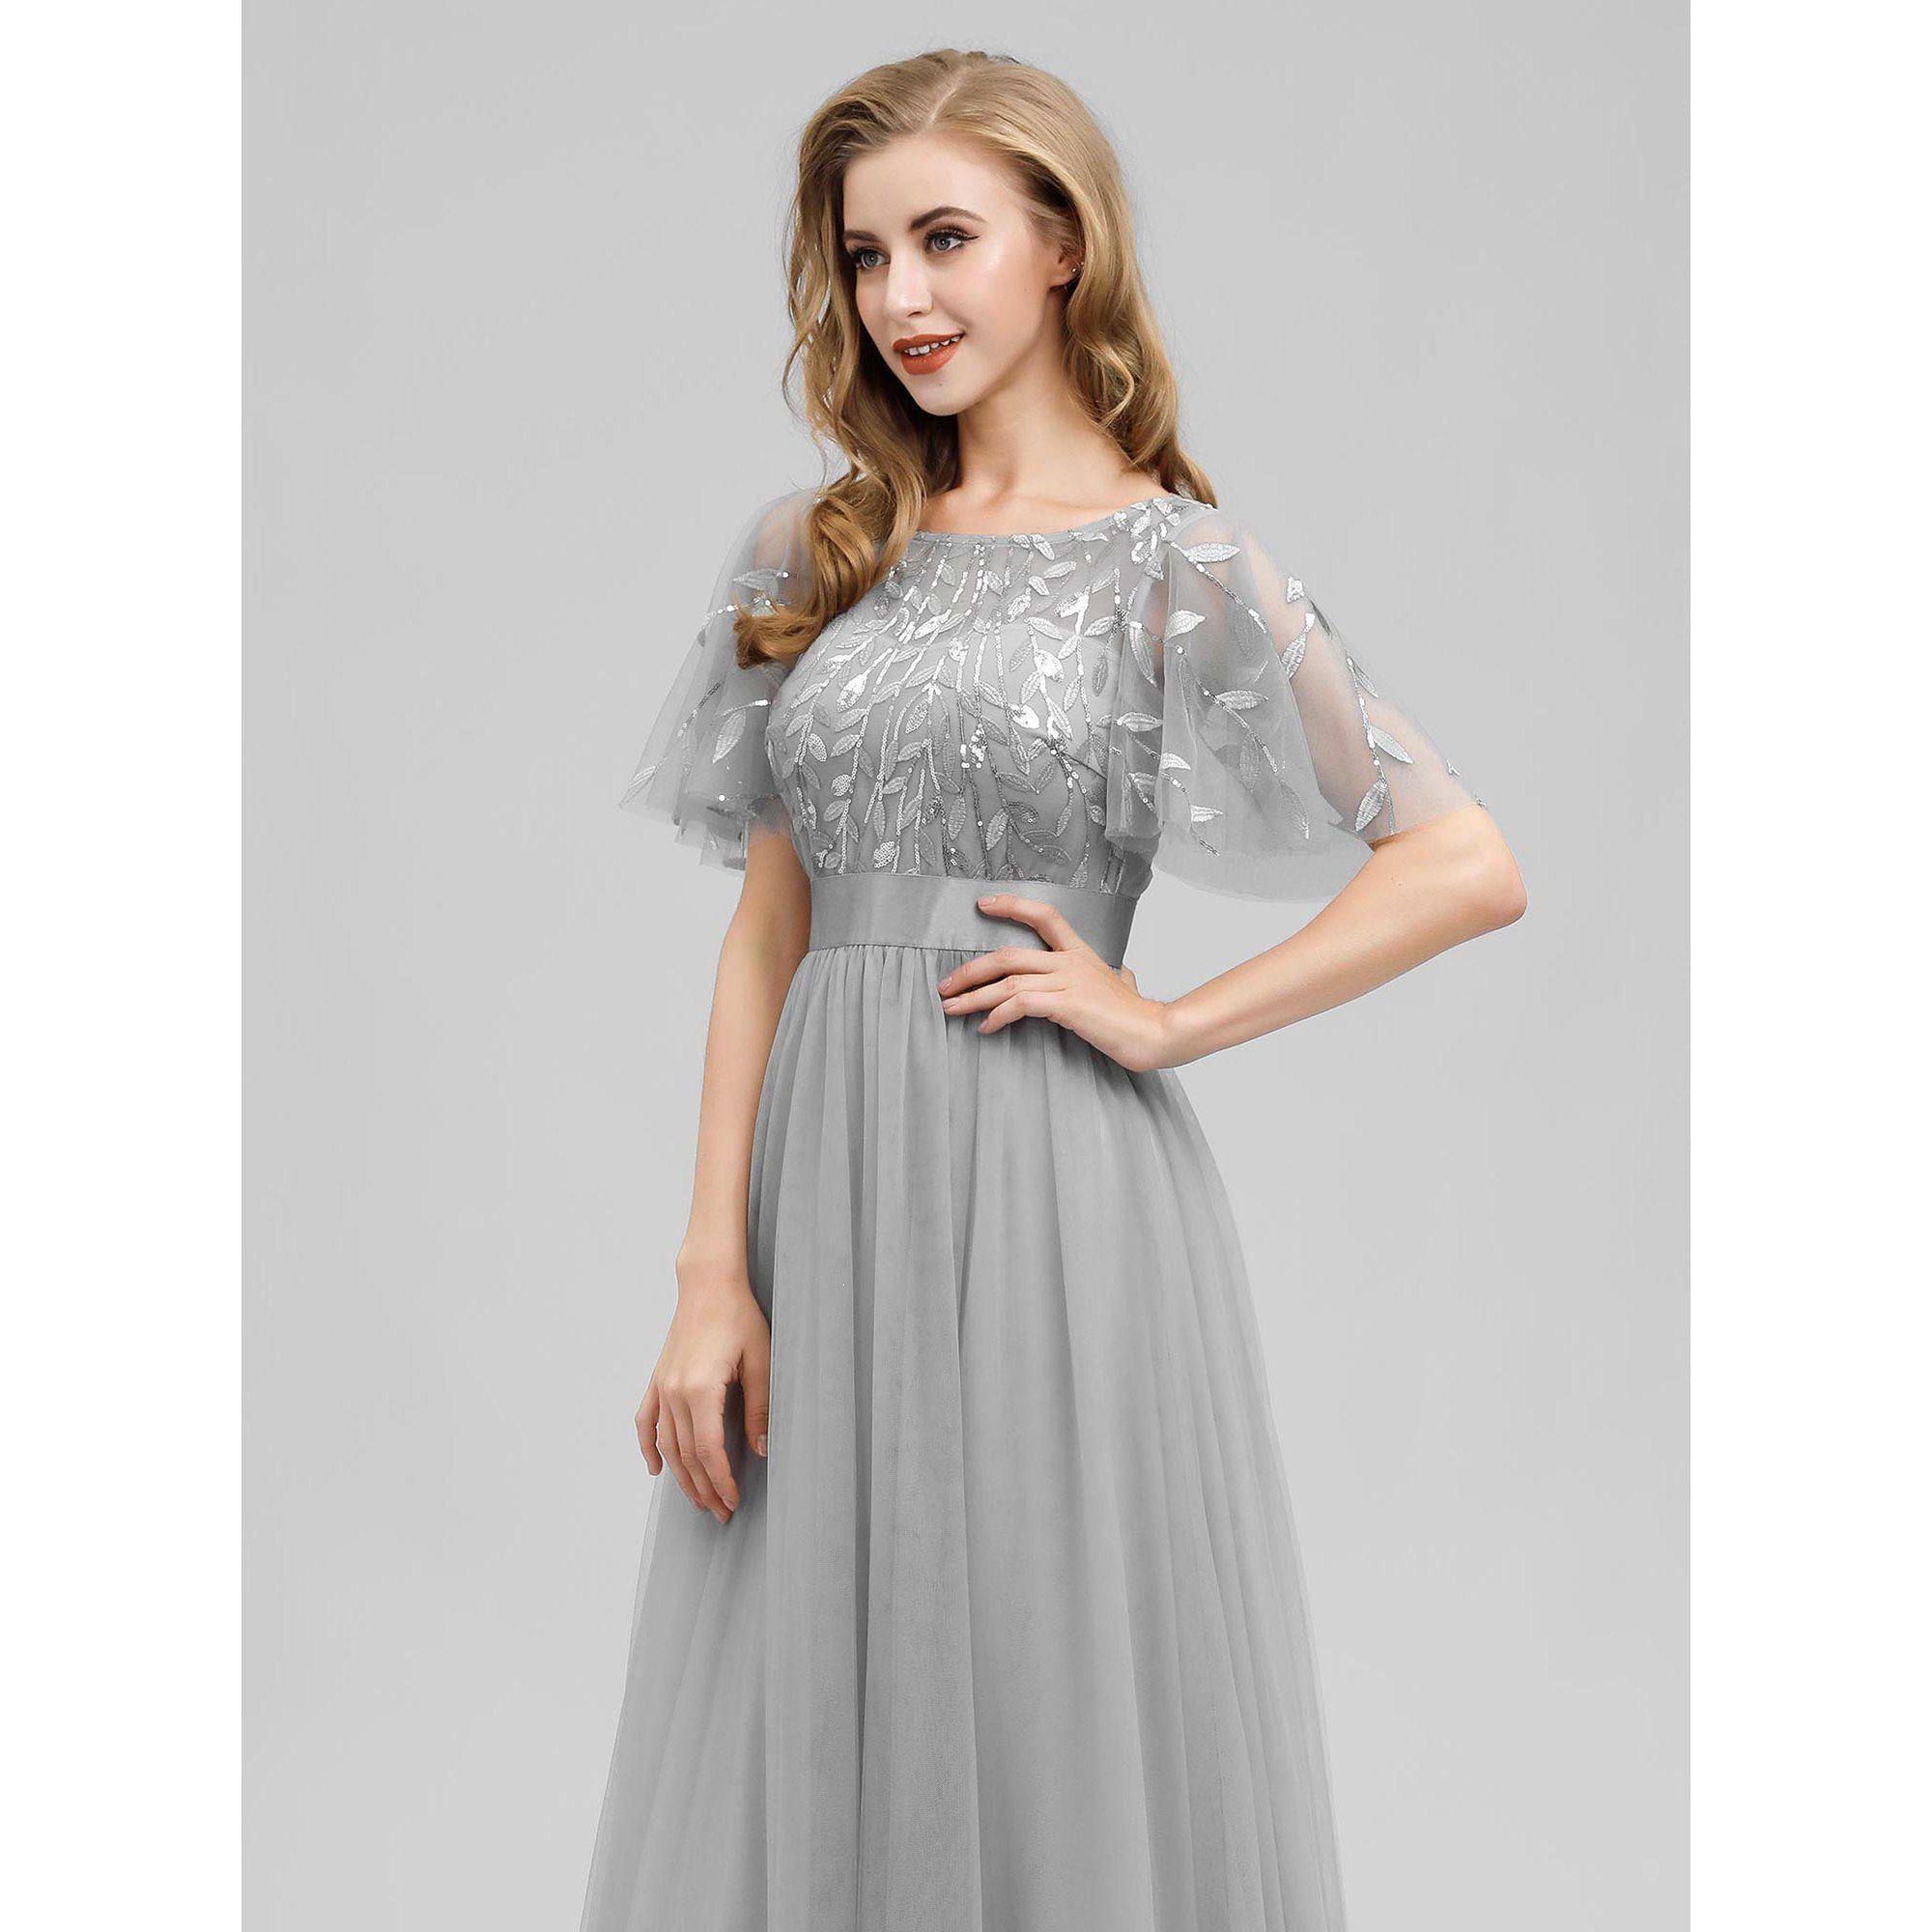 Ever Pretty Ever Pretty Womens Plus Size Bridesmaid Dresses For Women 00904 Grey Us18 Walmart Com In 2021 Bridesmaid Dresses Plus Size Beautiful Evening Dresses Formal Evening Dresses [ 2000 x 2000 Pixel ]